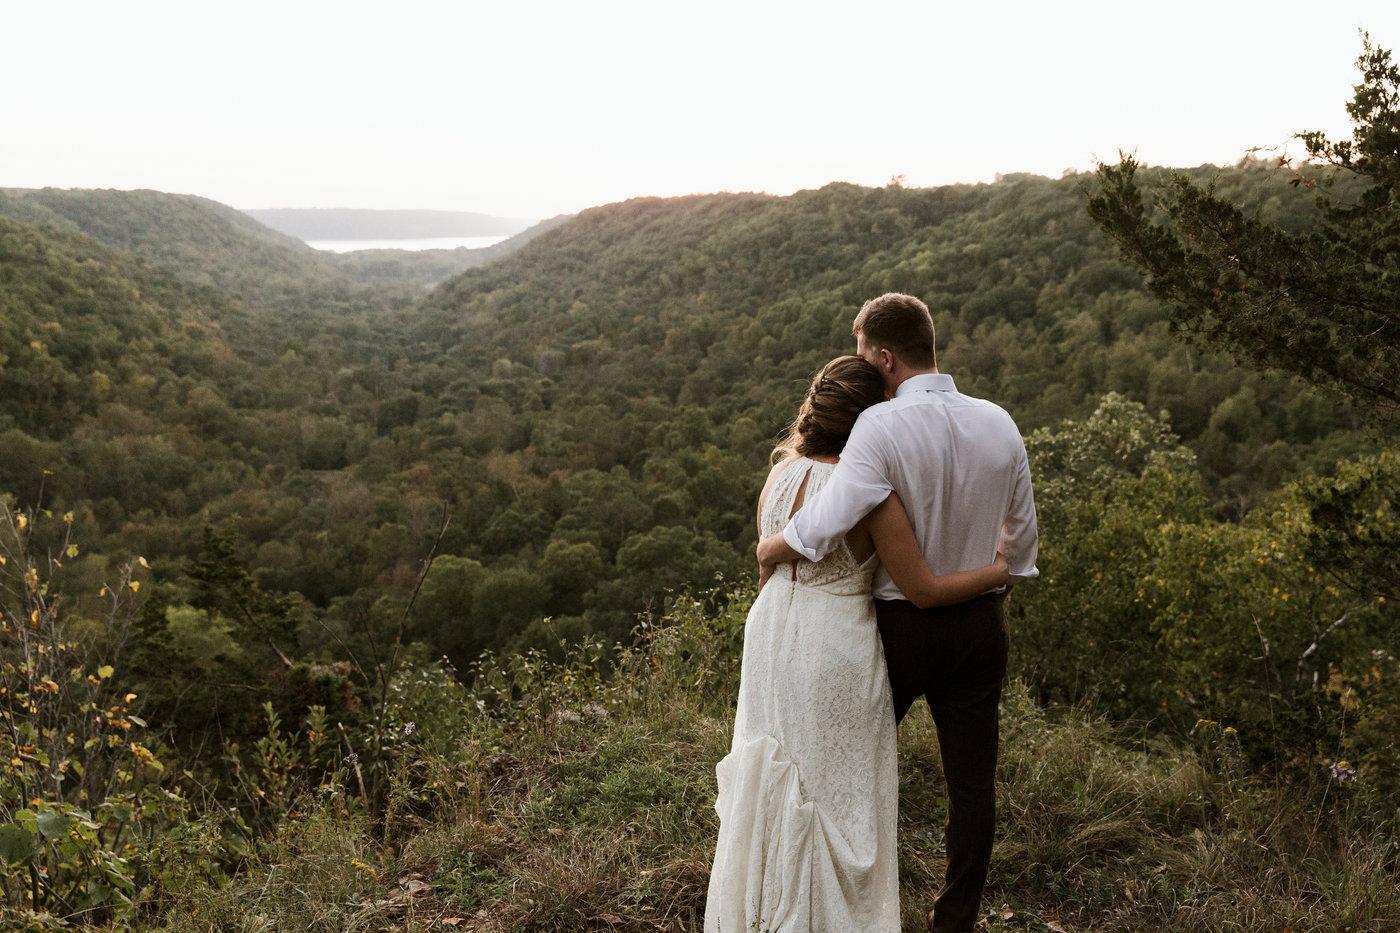 View More: https://kelseylarsonphoto.pass.us/kale-stephanie-wedding